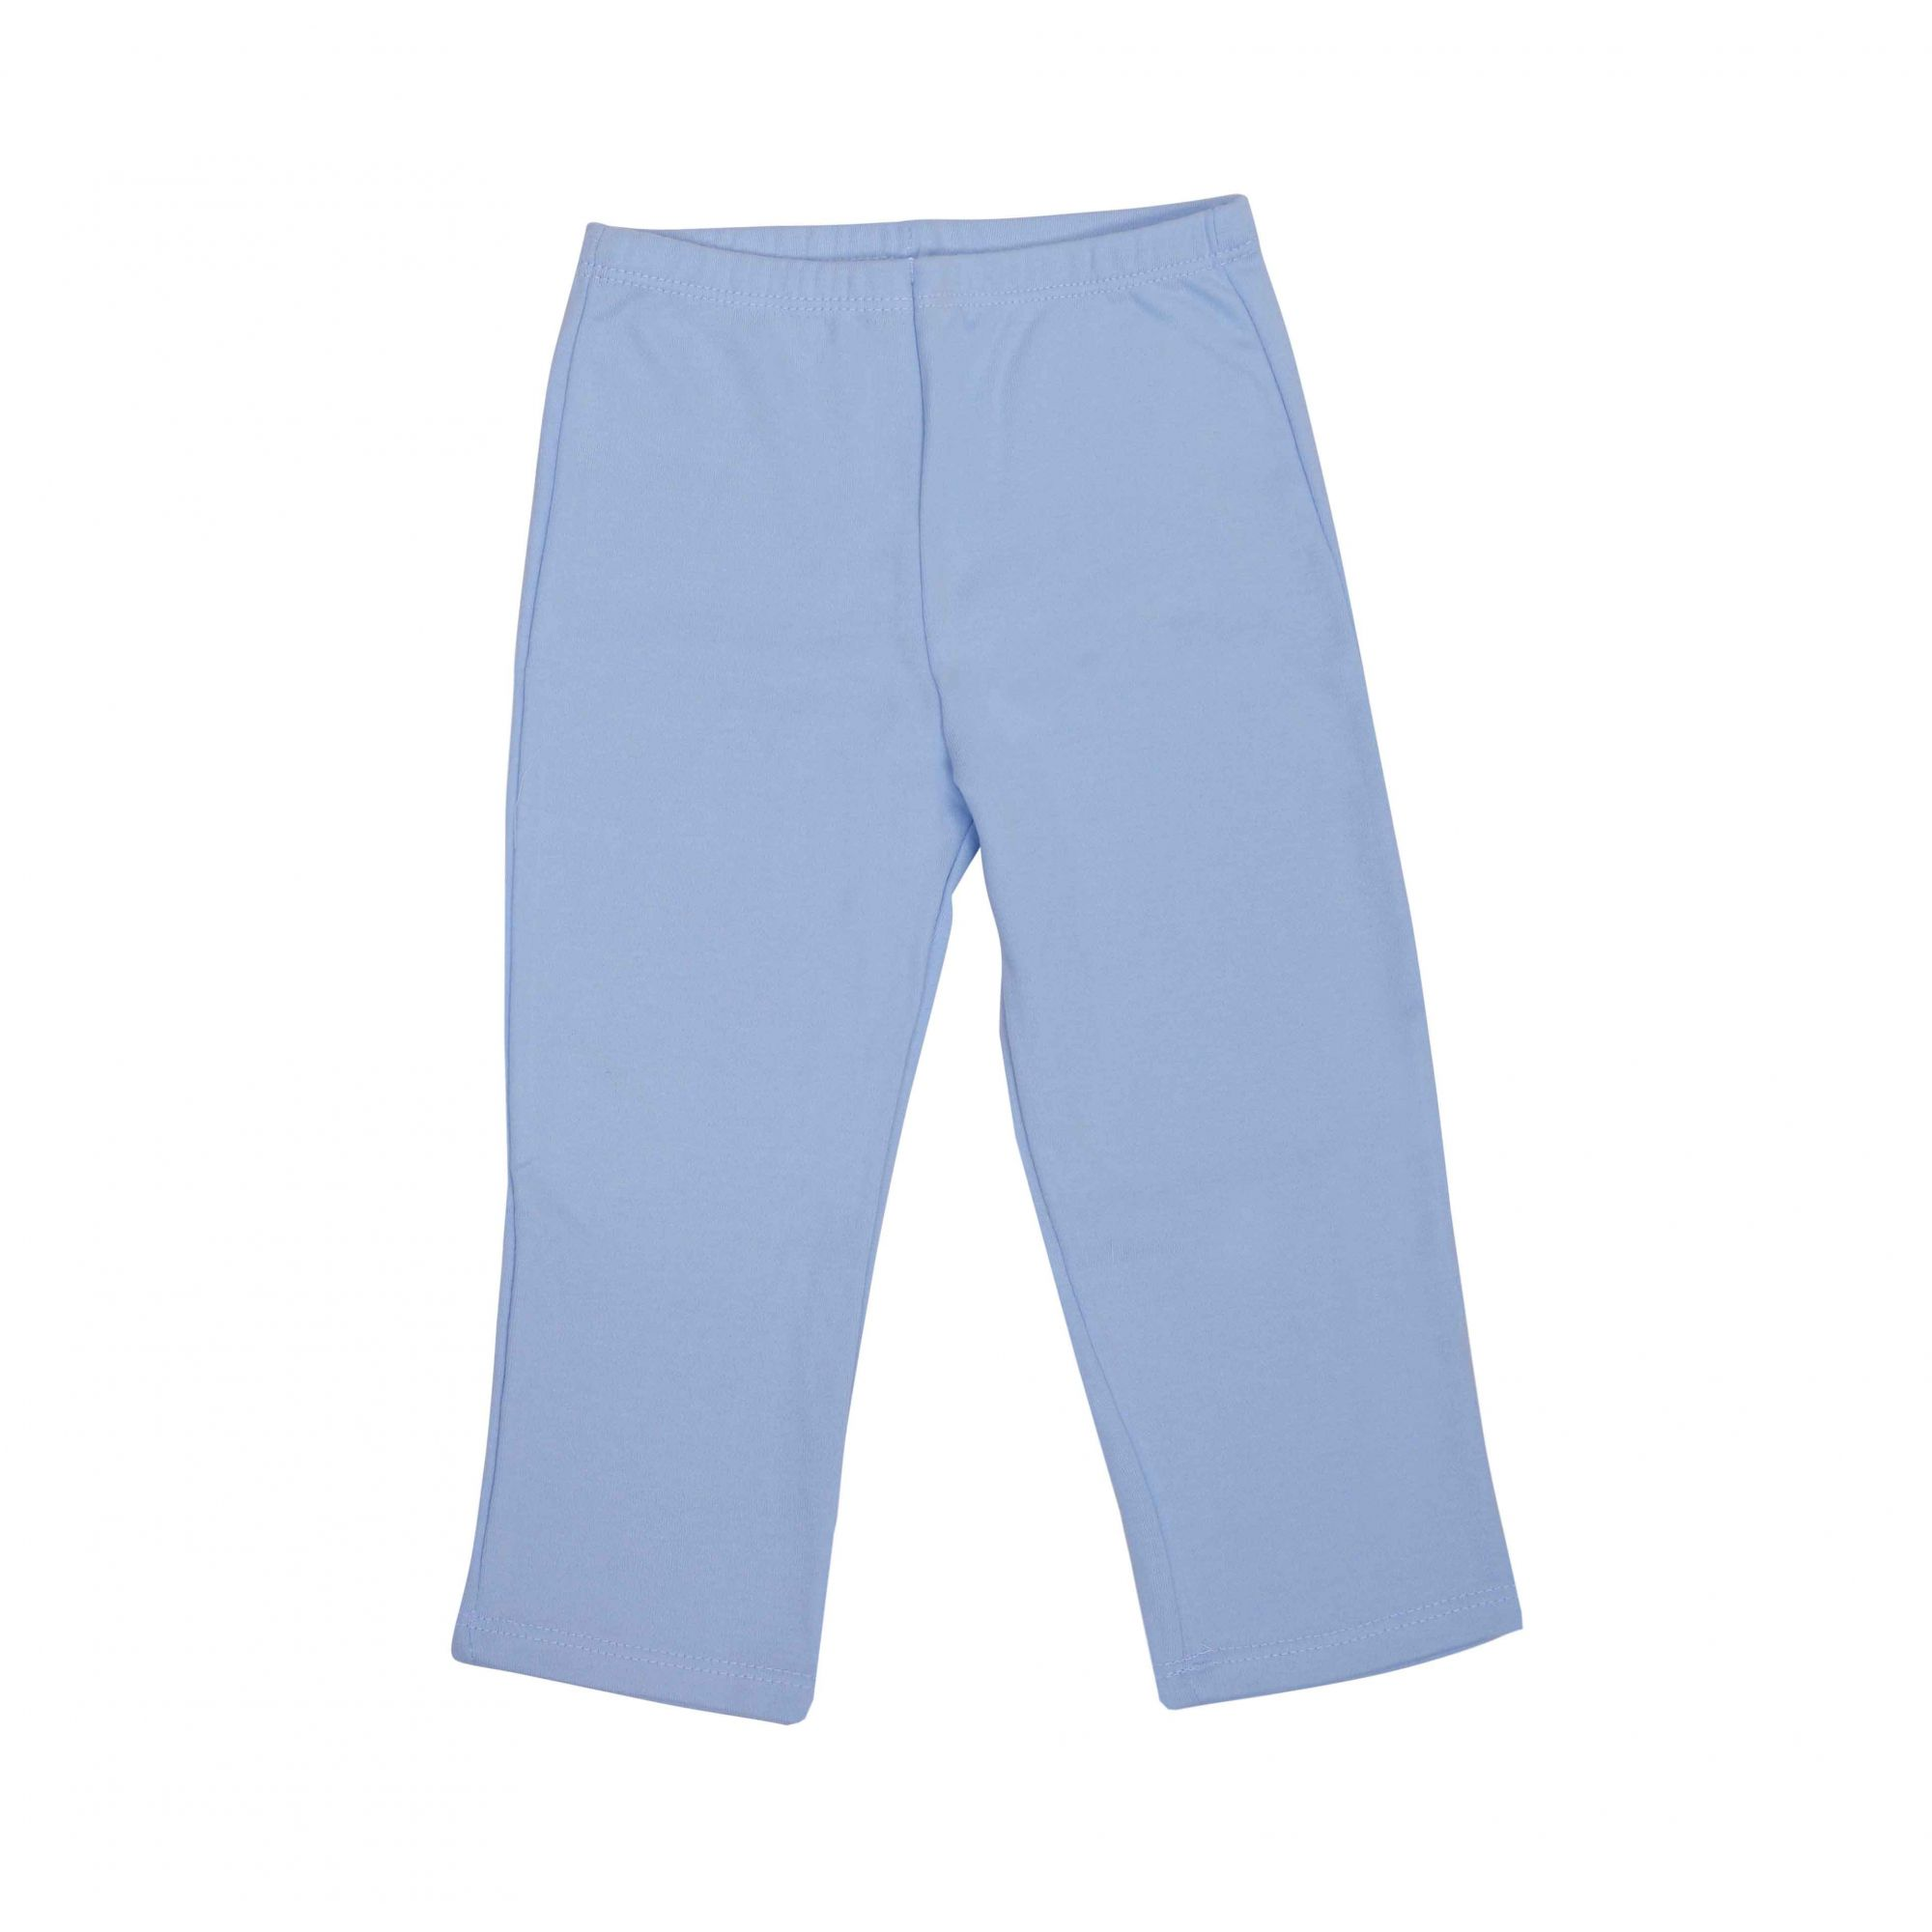 Kit Pijama Camiseta Manga Curta e Calça Azul